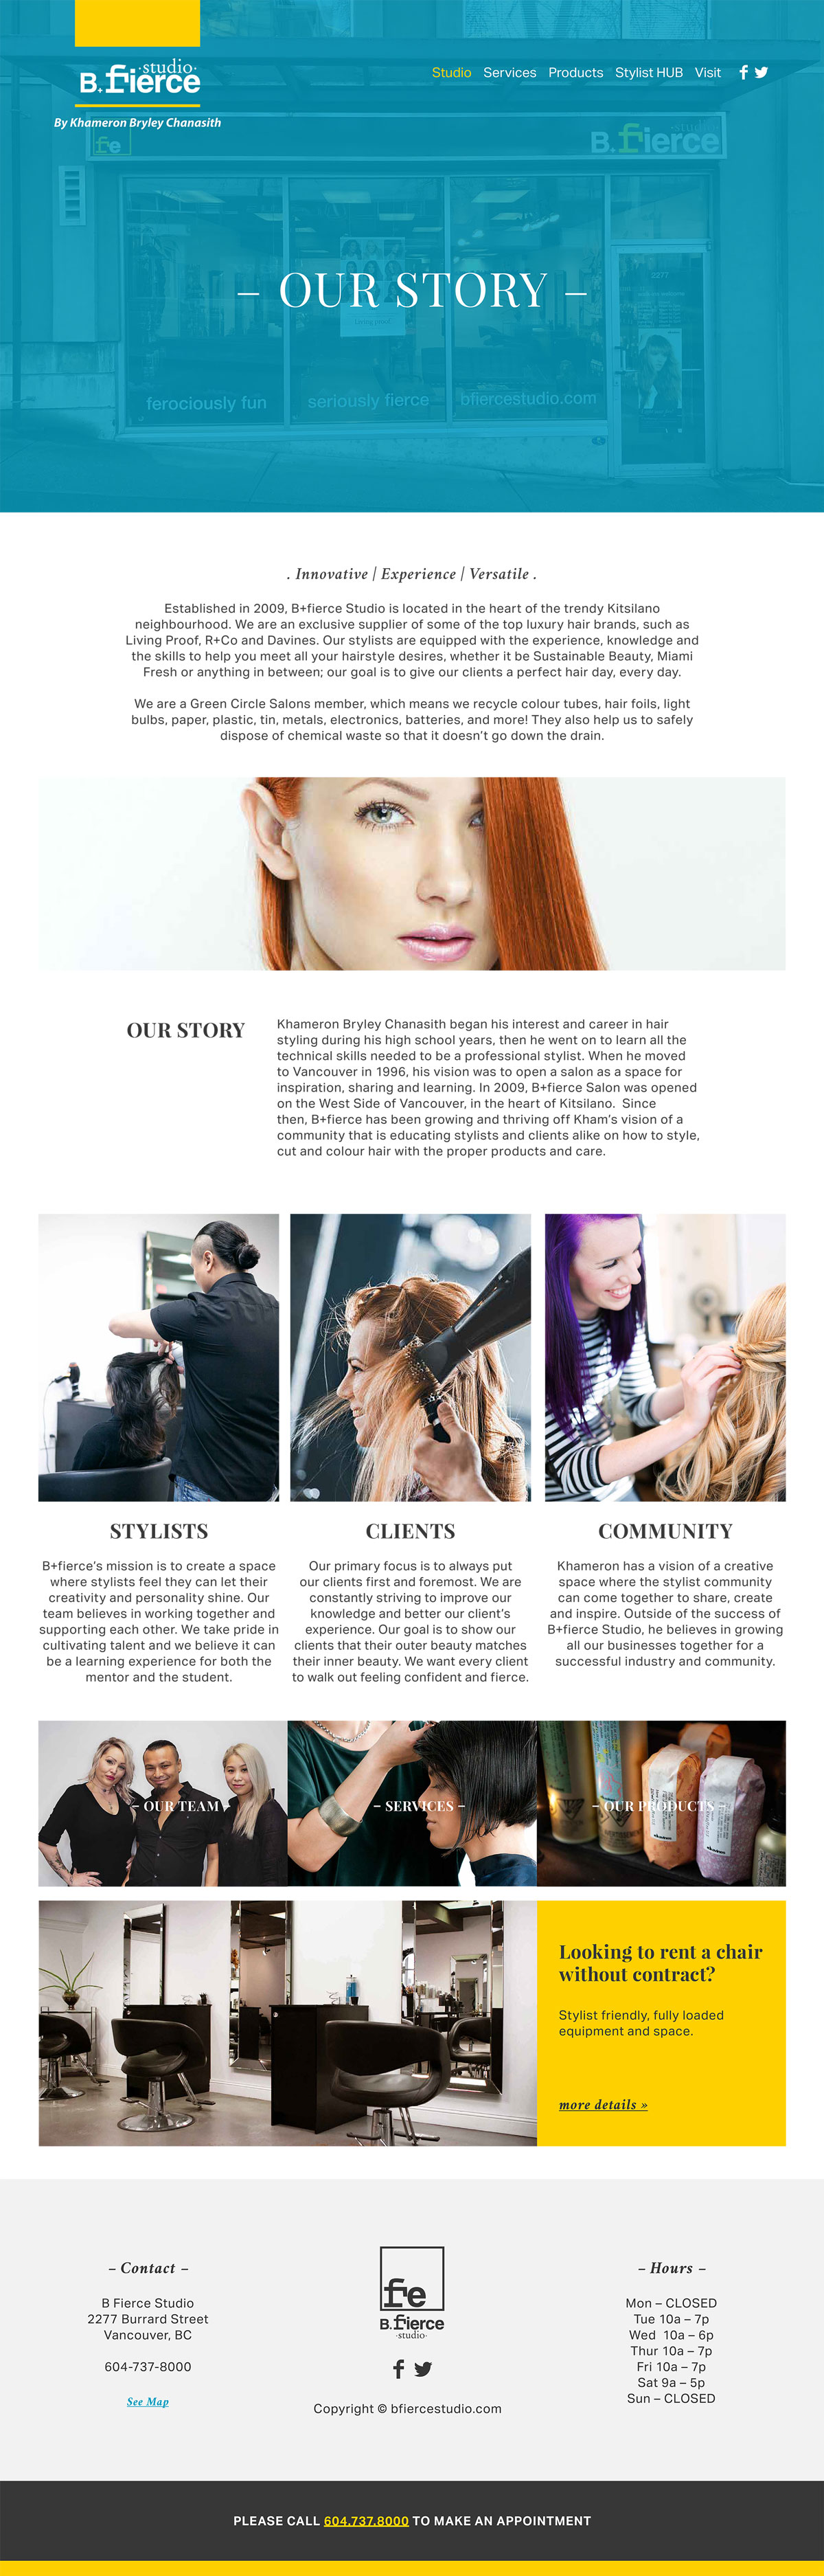 B Fierce - Our Story Website Design